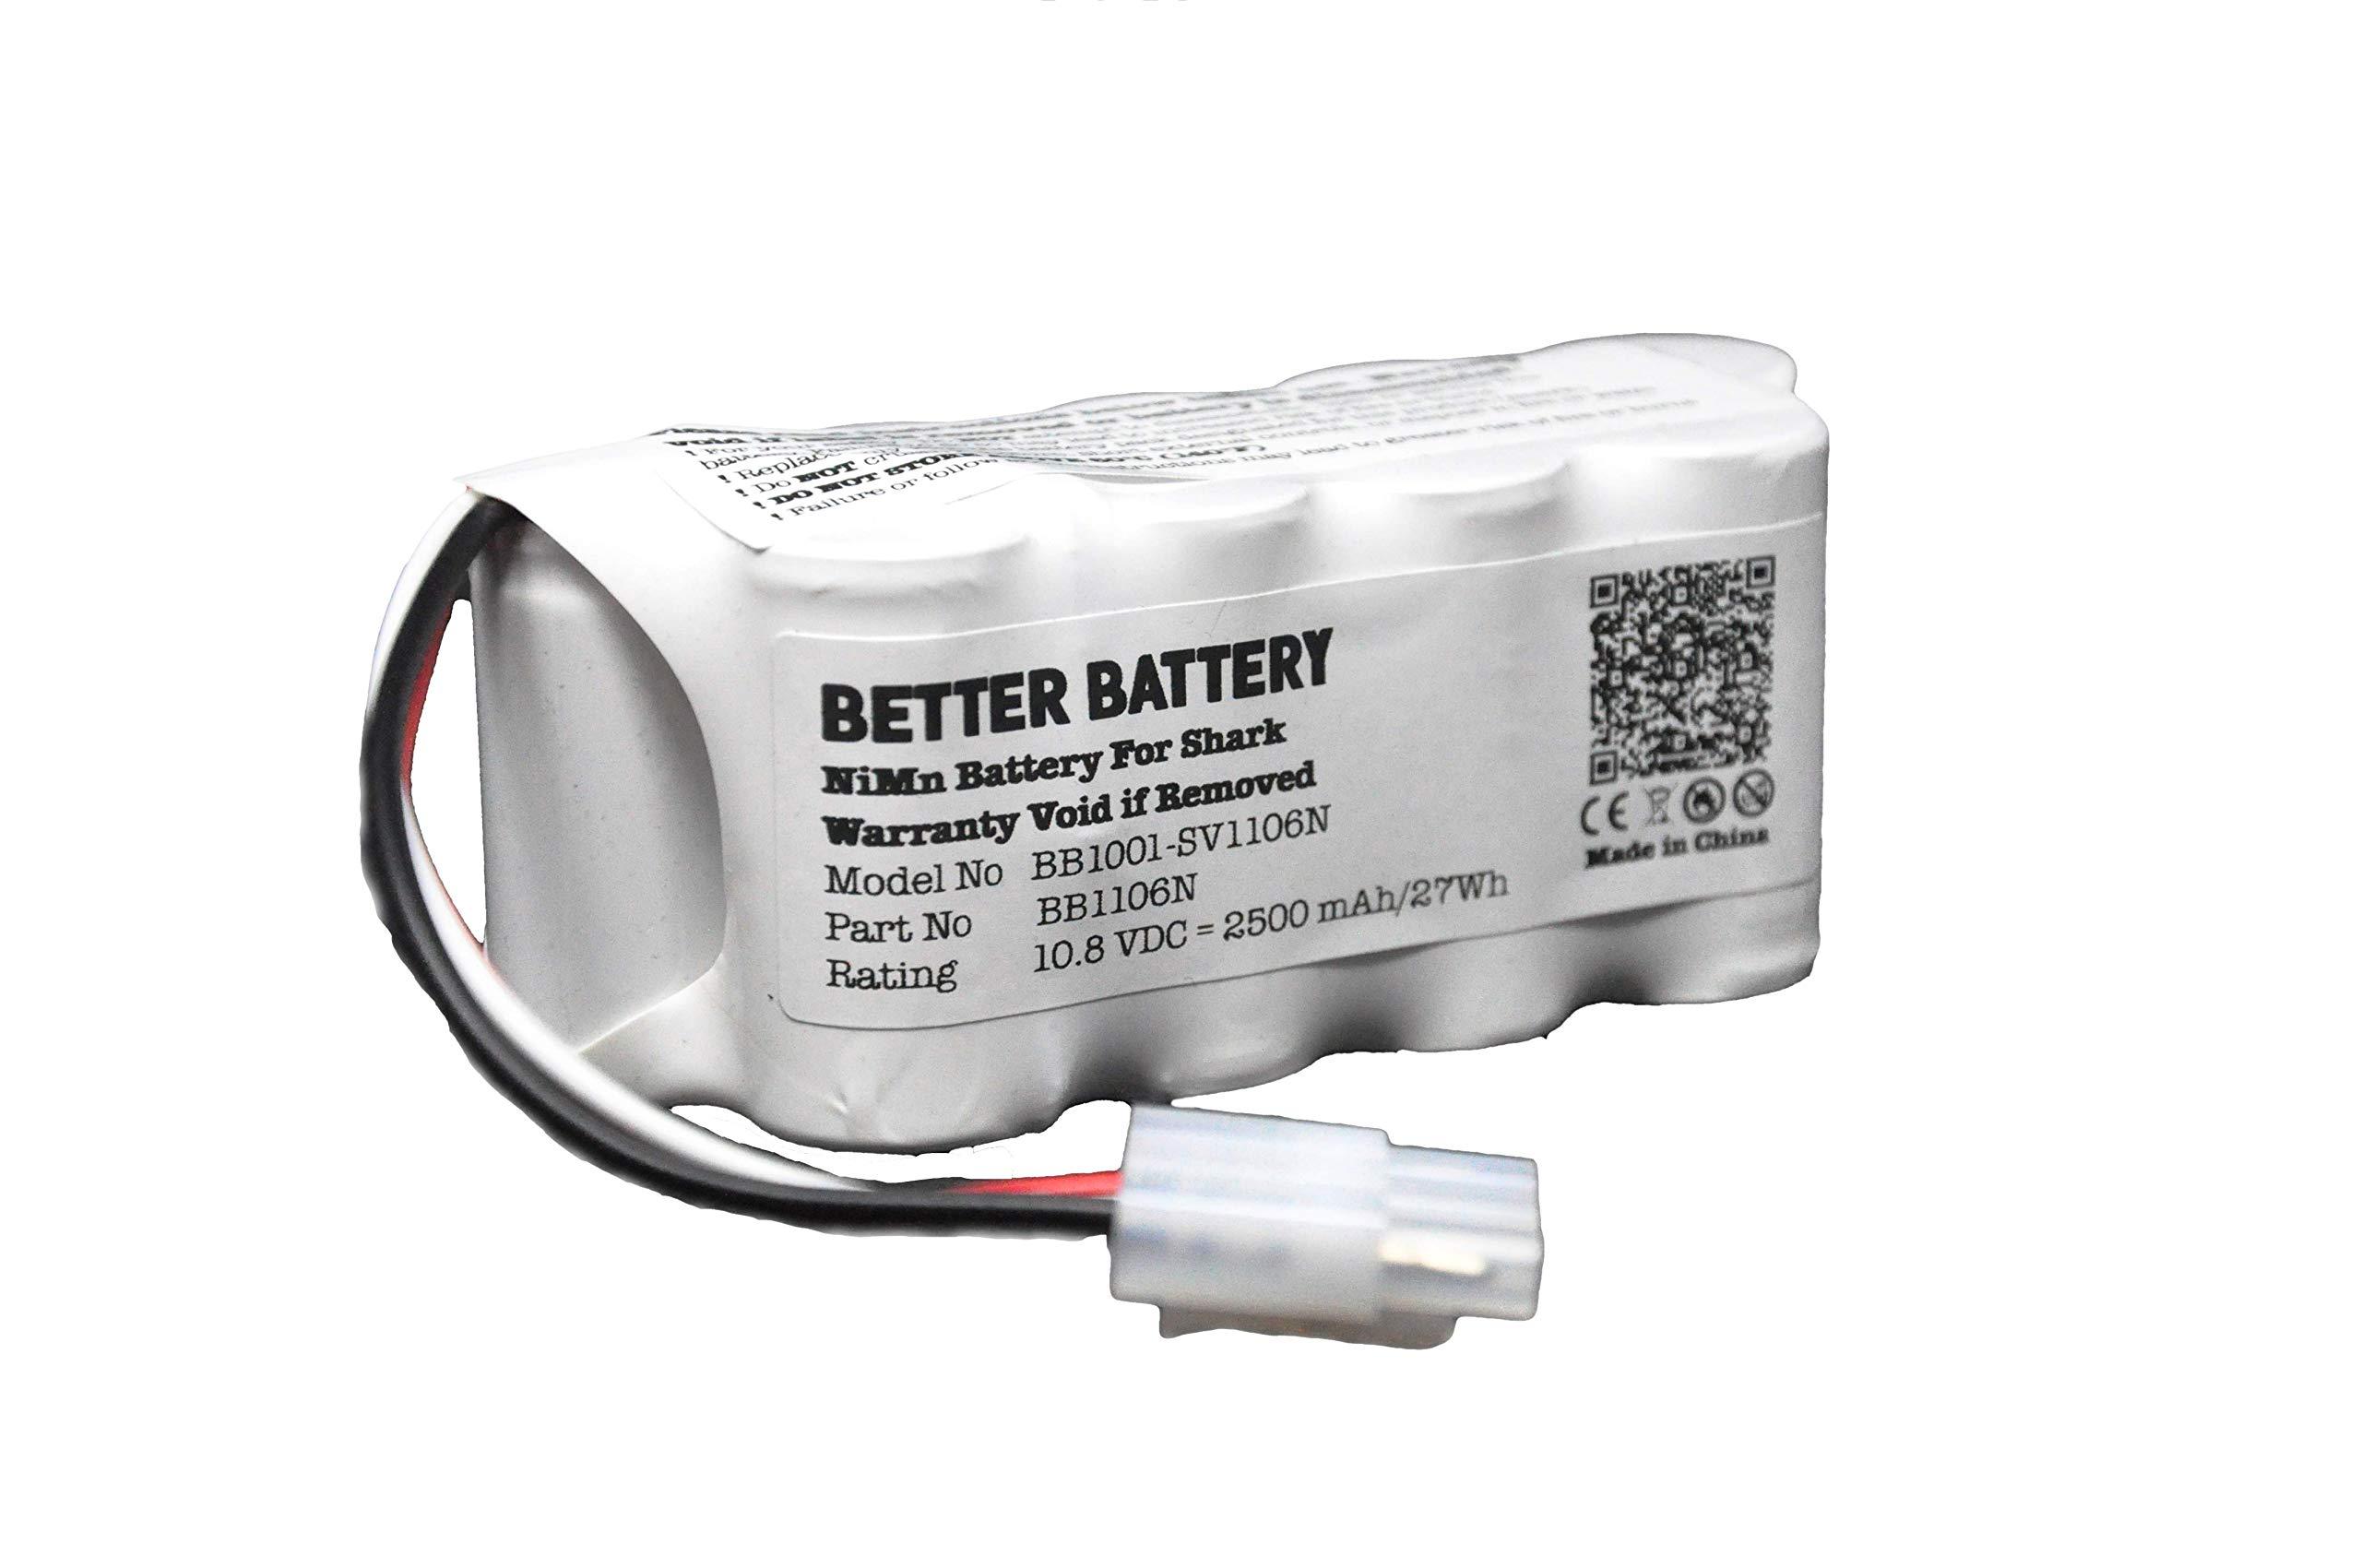 Better Battery Vacuum Battery for Shark Navigator Freestyle Cordless Stick Vacuums XBT1106N SV1110 SV1106N SV1110N SV11O6N SV116N by Better Battery